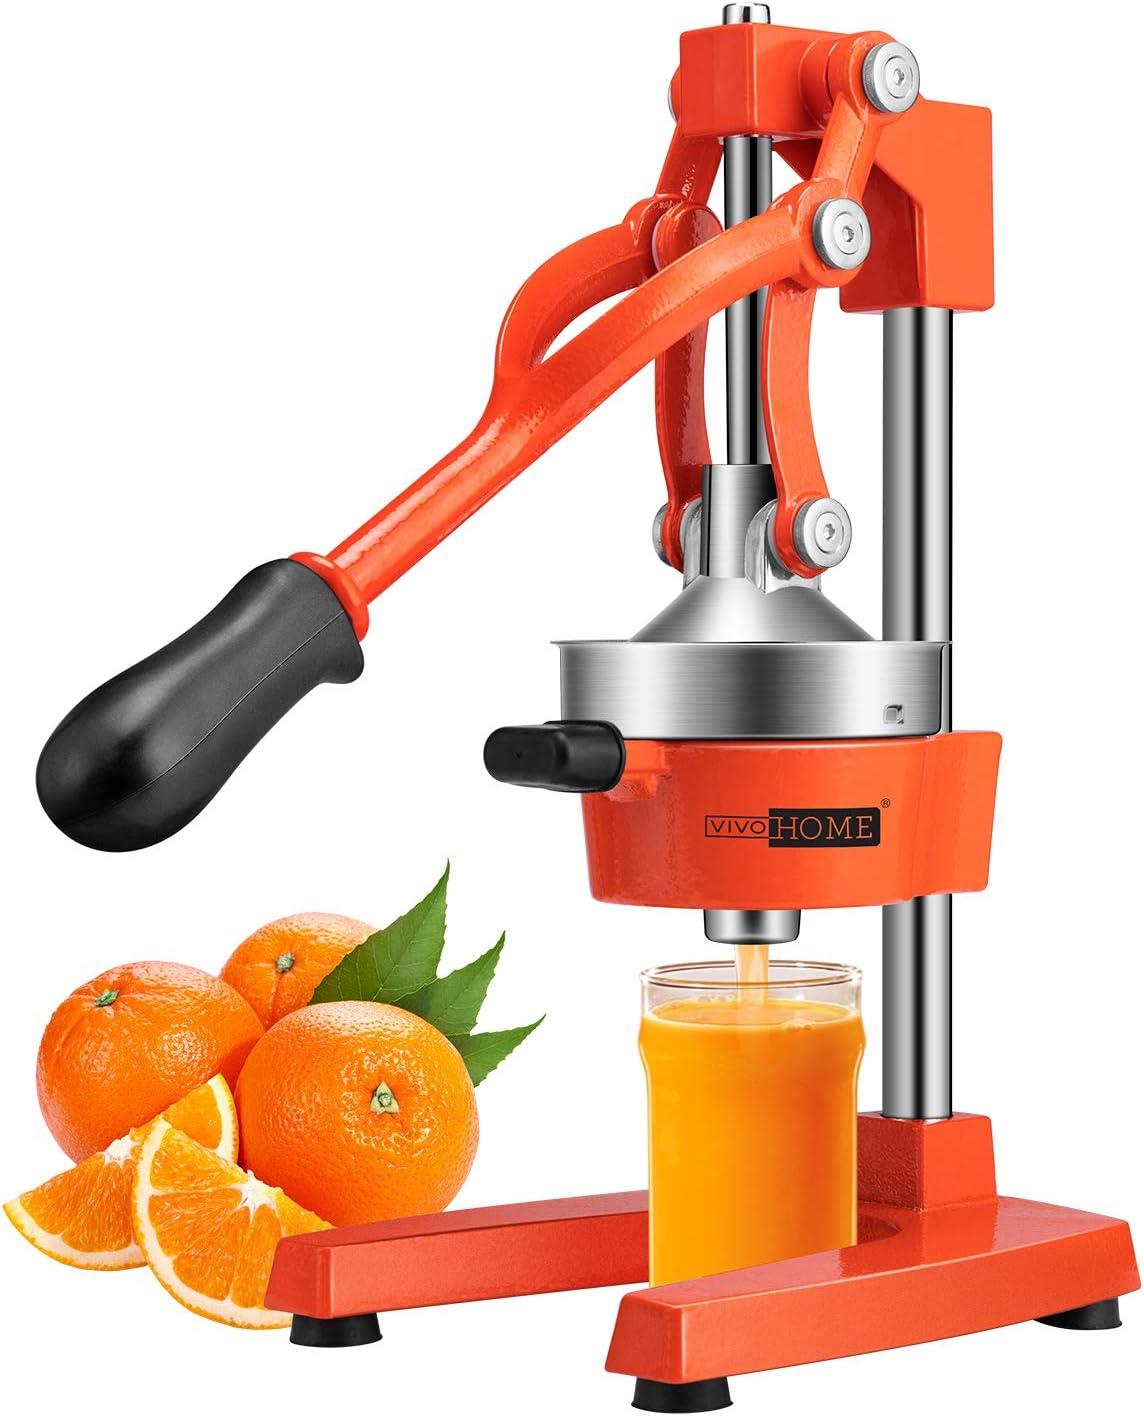 VIVOHOME Heavy Duty Commercial Manual Hand Press Citrus Orange Lemon Juicer Squeezer Machine FDA Approved